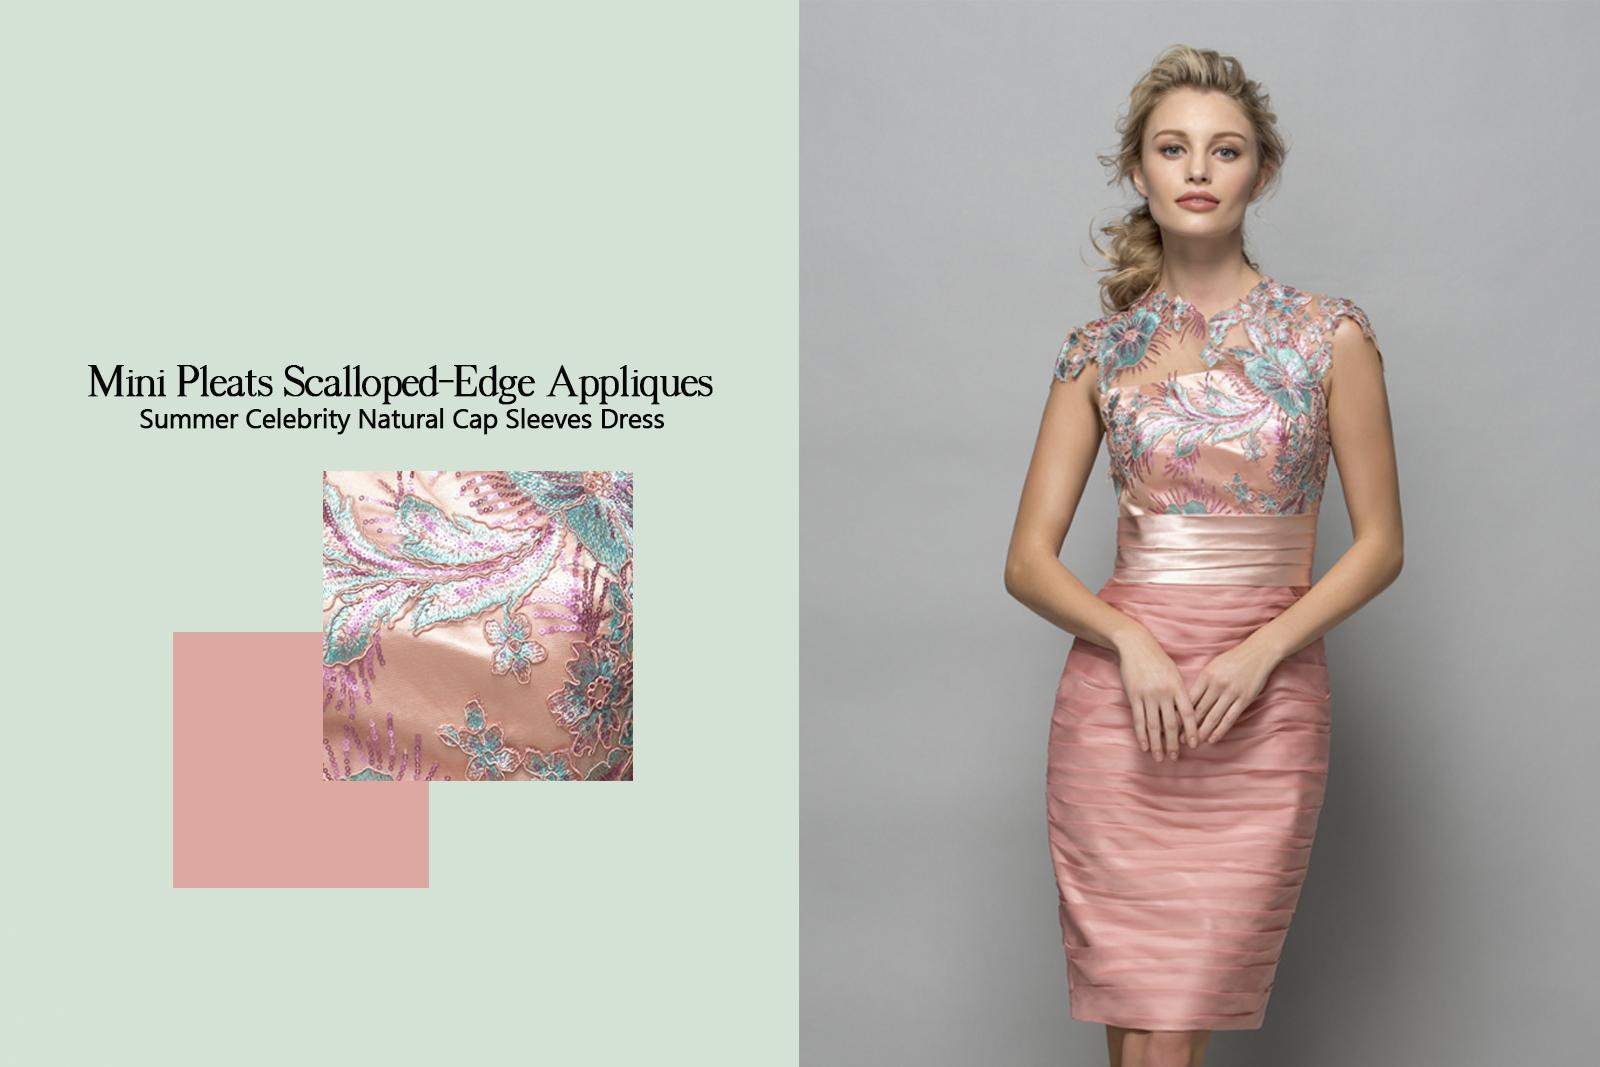 Short/Mini Pleats Scalloped-Edge Appliques Summer Celebrity Natural Cap Sleeves Dress